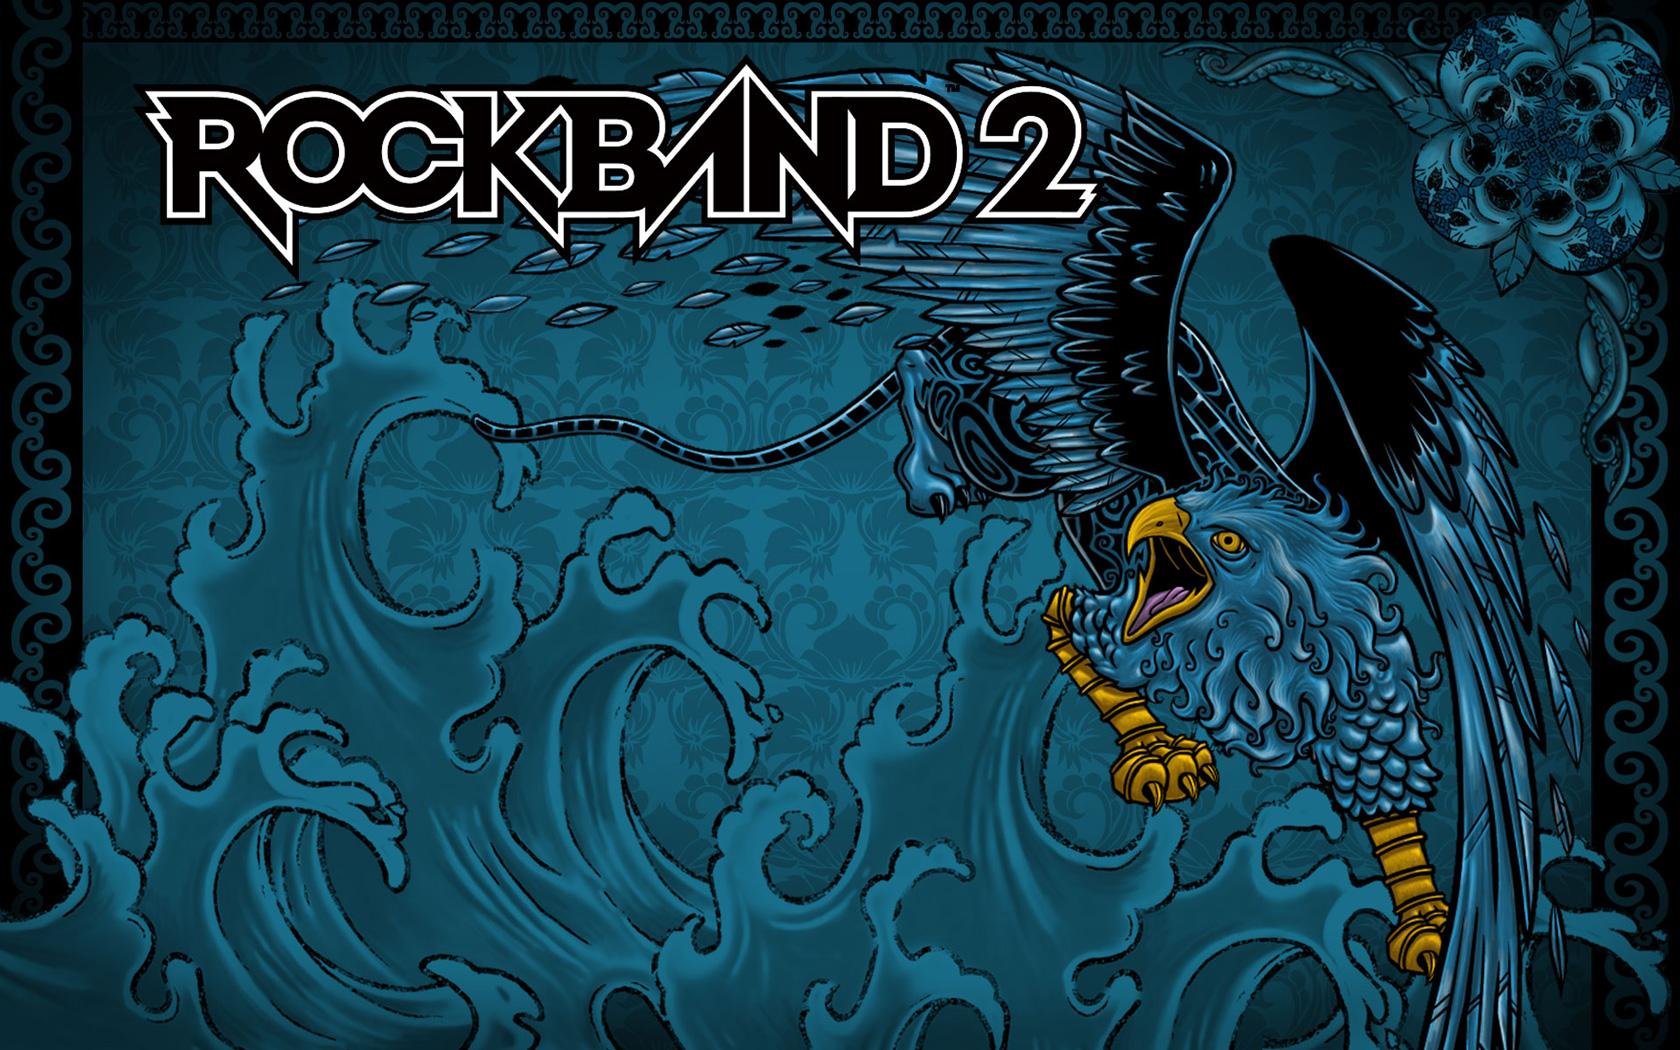 Rock Band 2 Wallpaper in 1680x1050